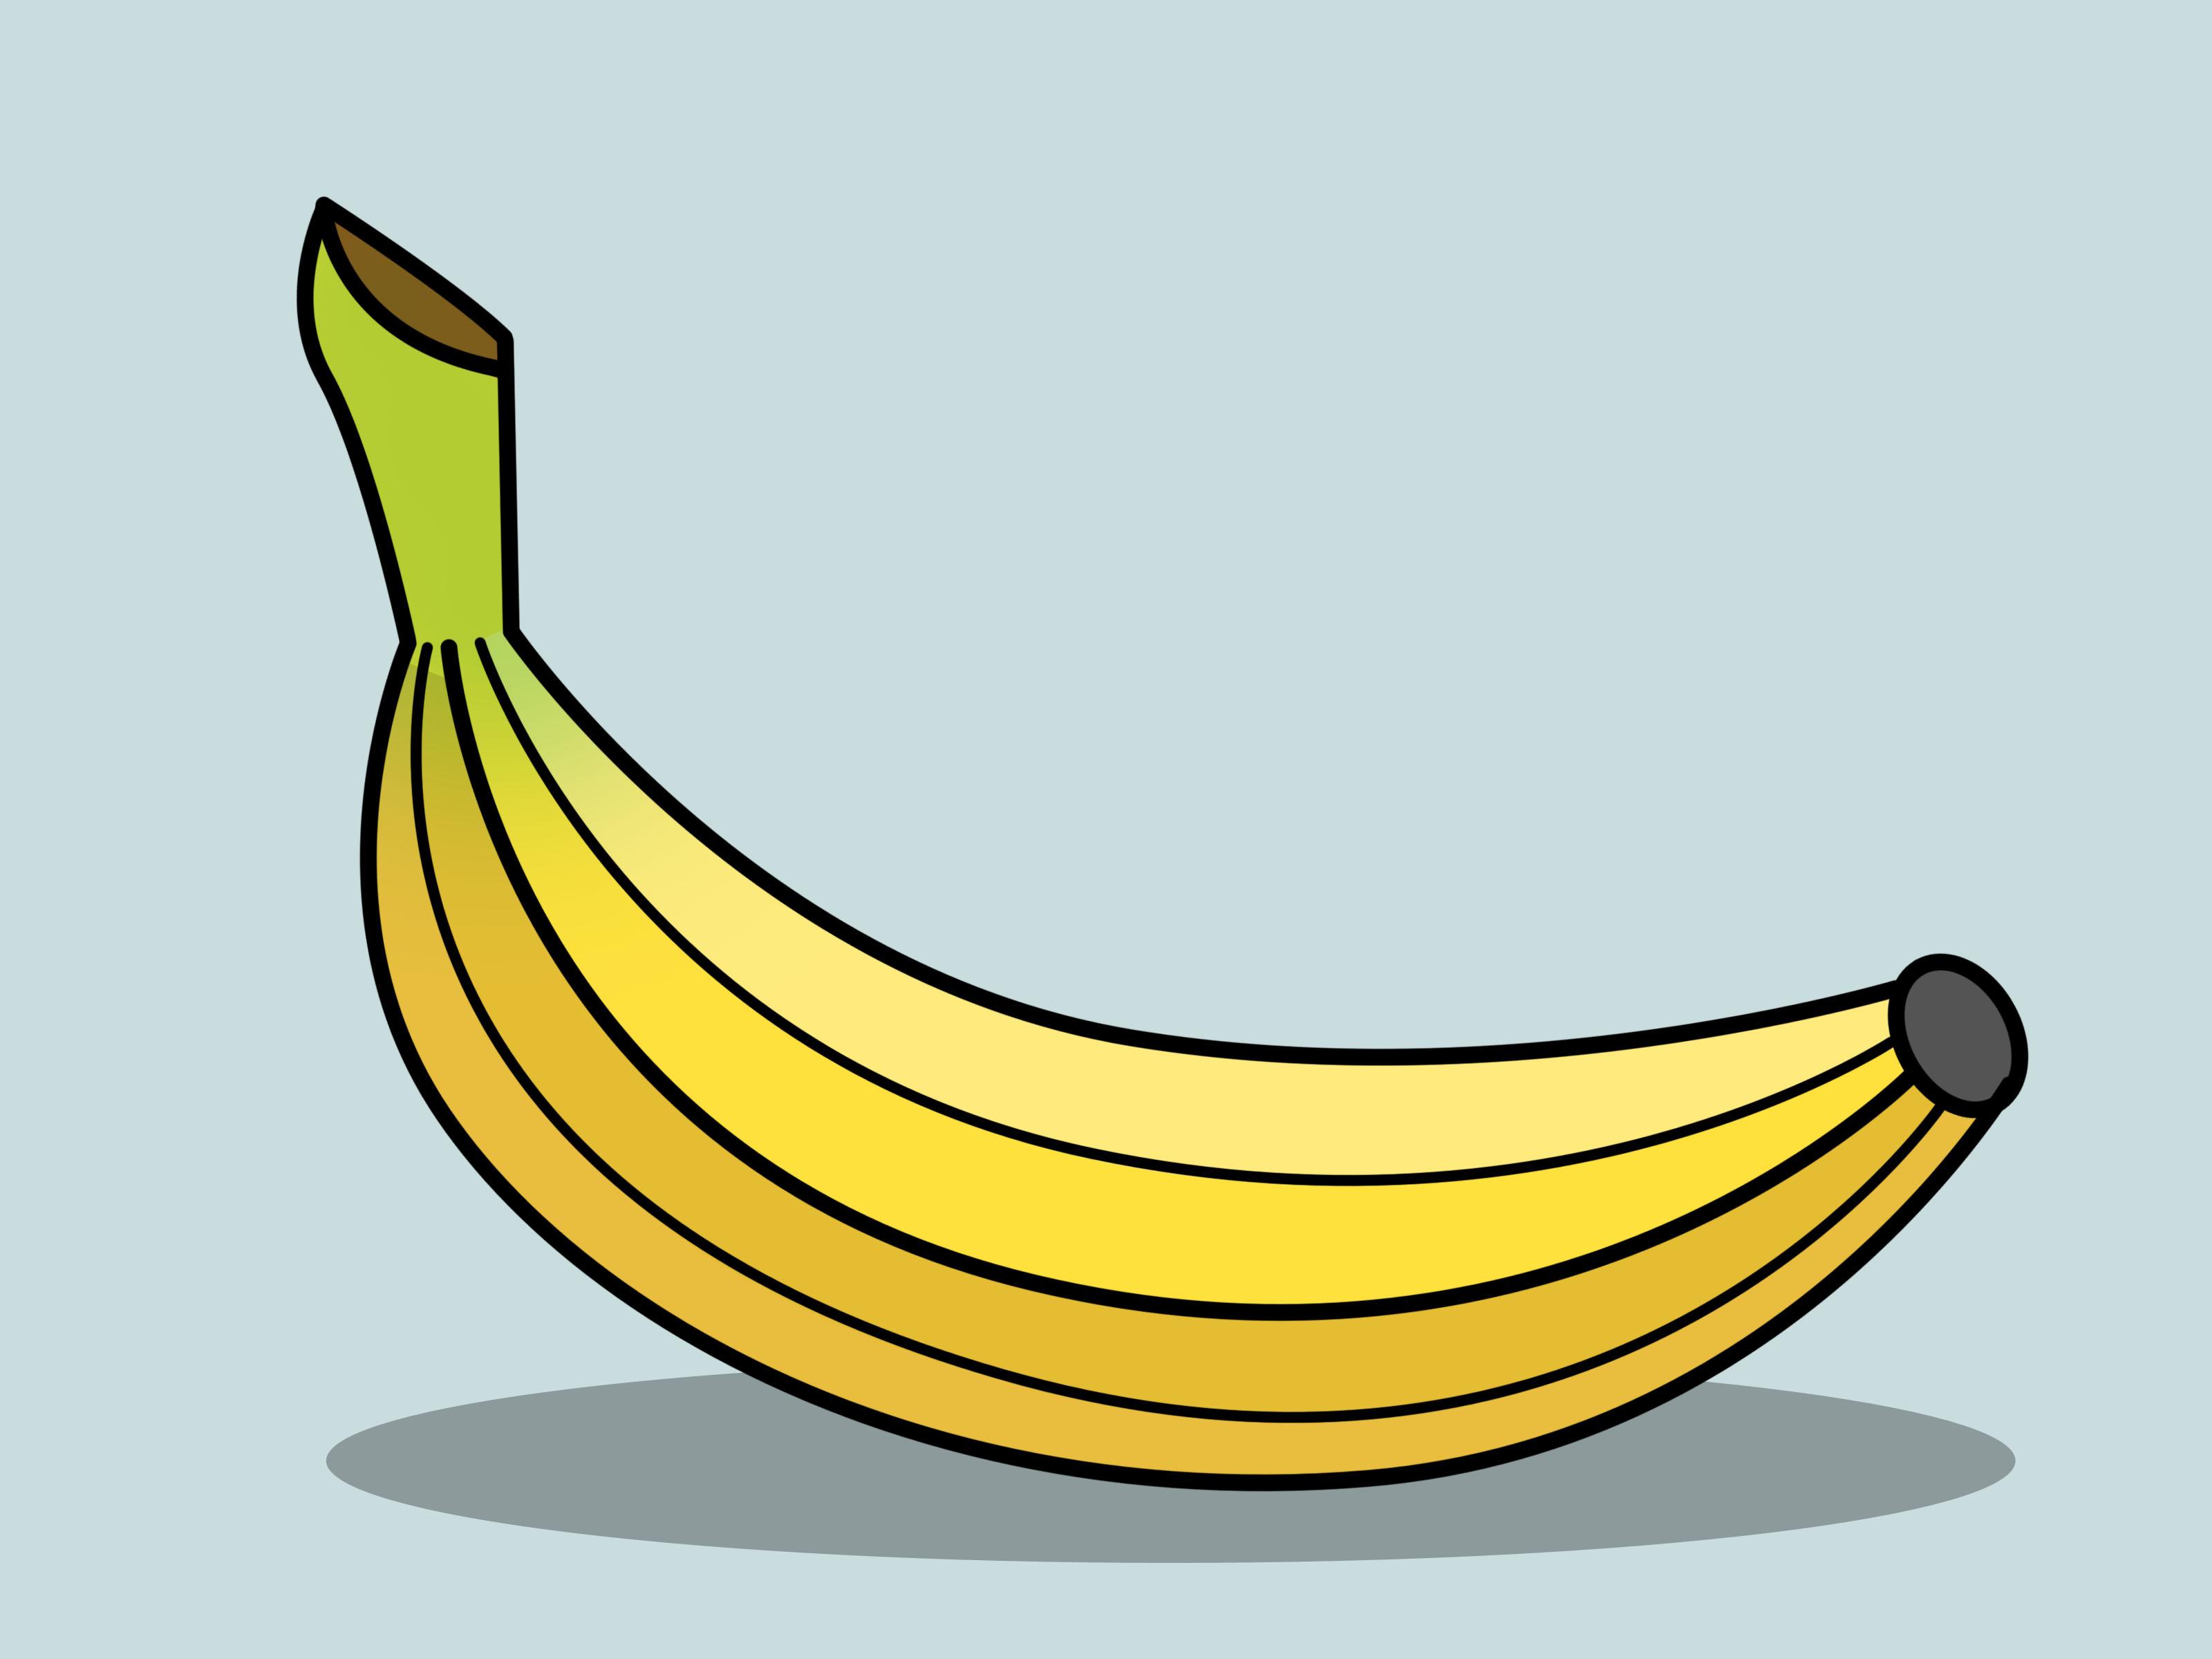 How to draw a. Banana clipart banna